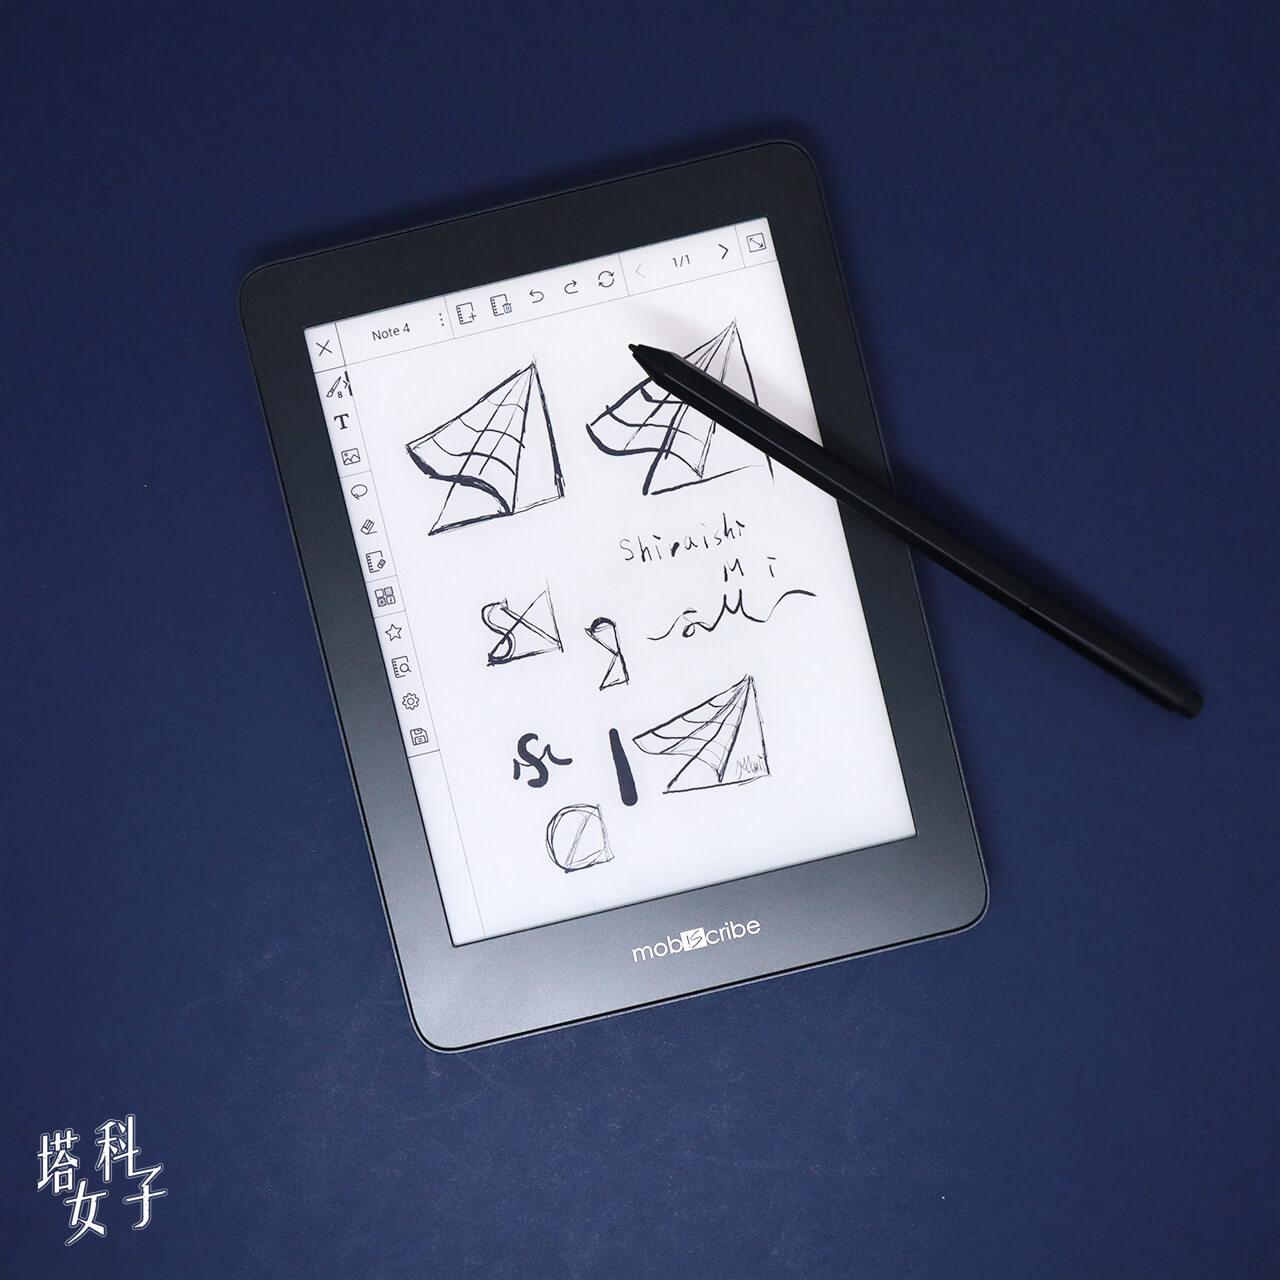 Mobiscribe 電子筆記本/閱讀器 畫插圖